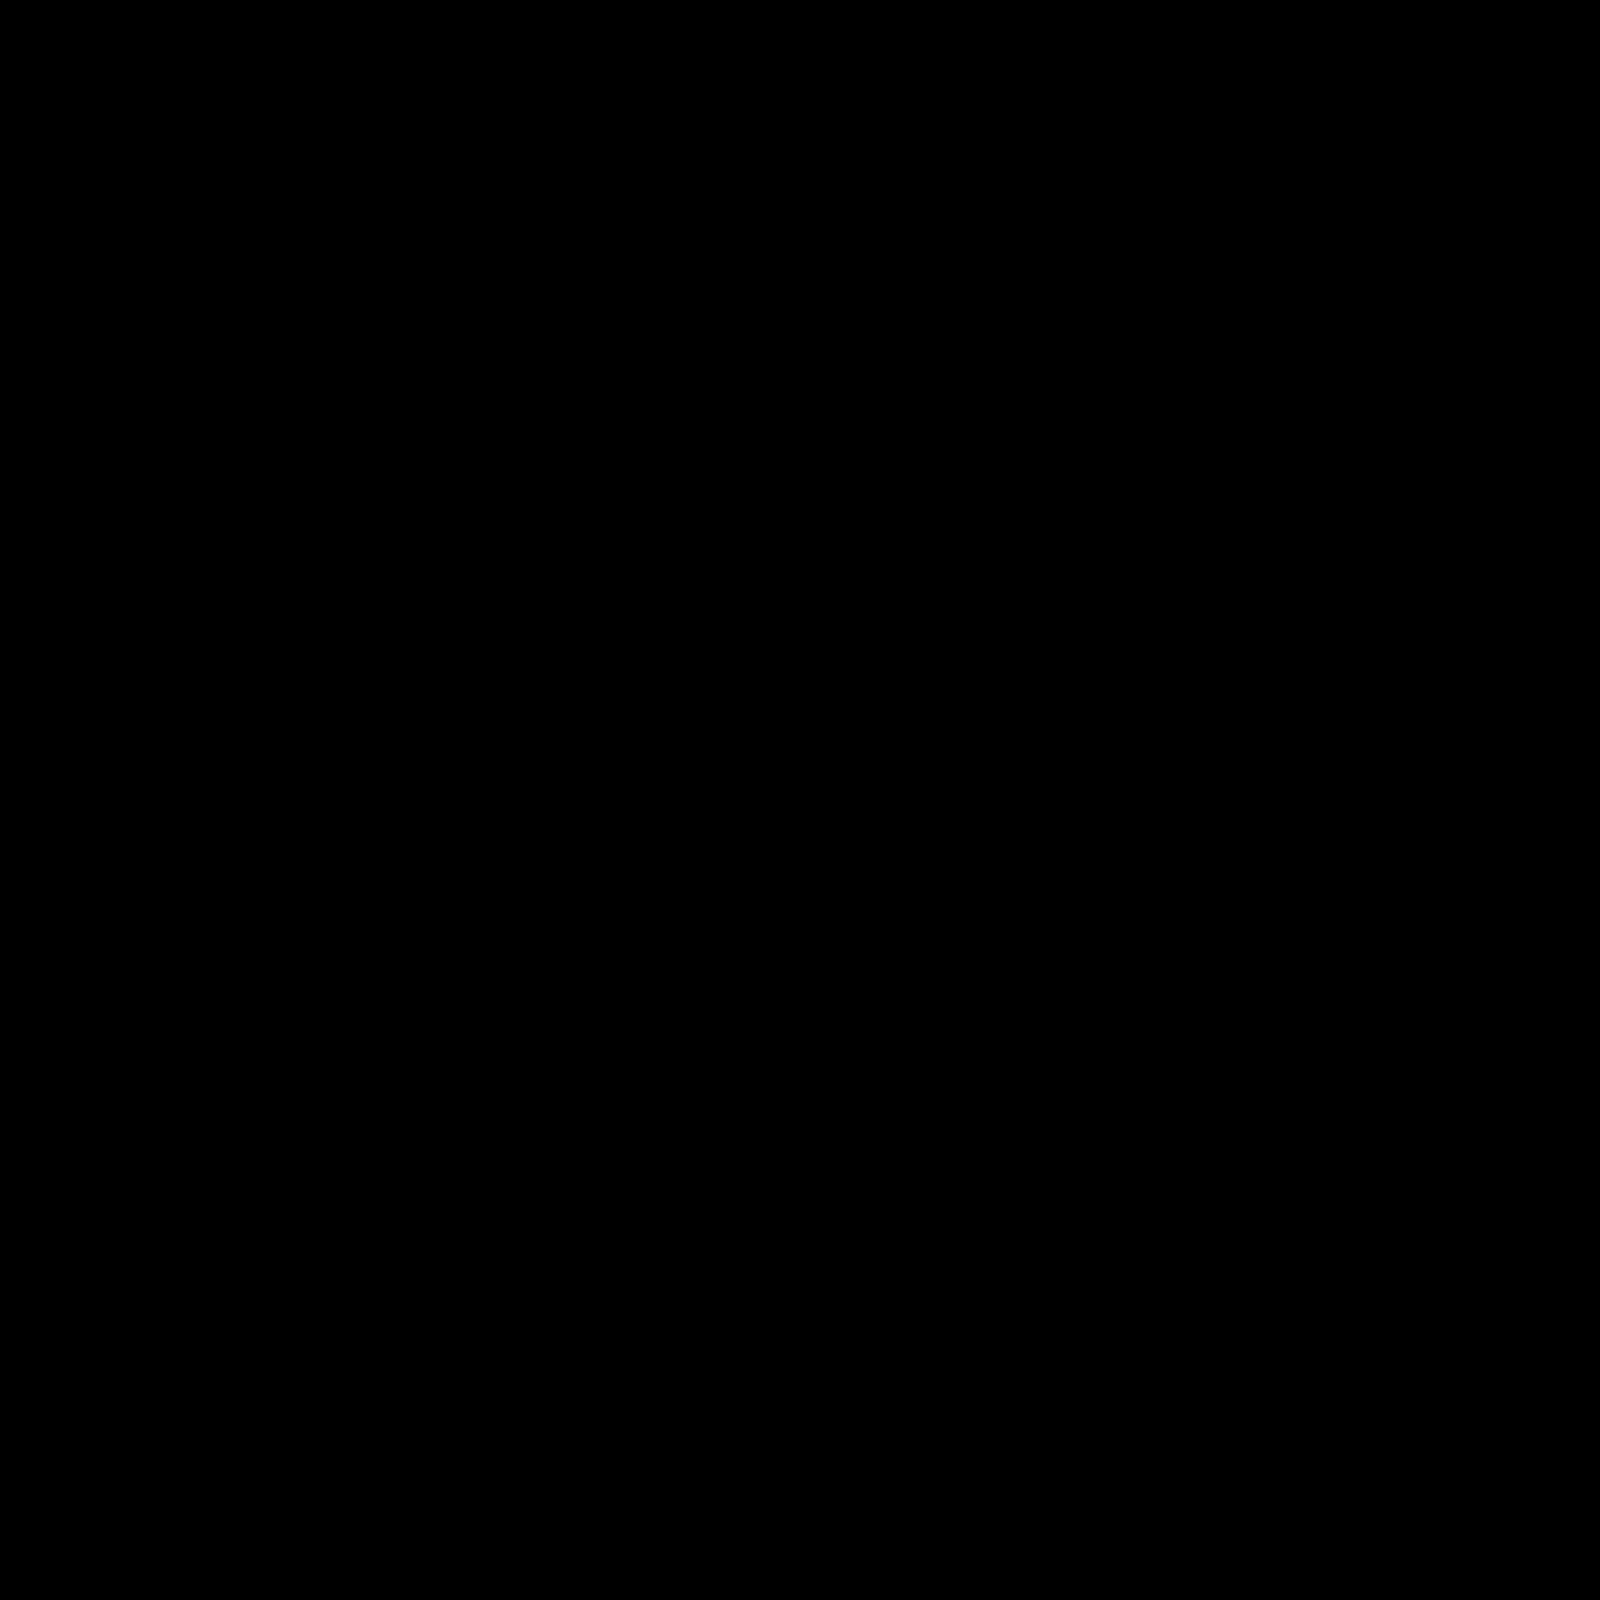 Blockchain Nowe logo icon